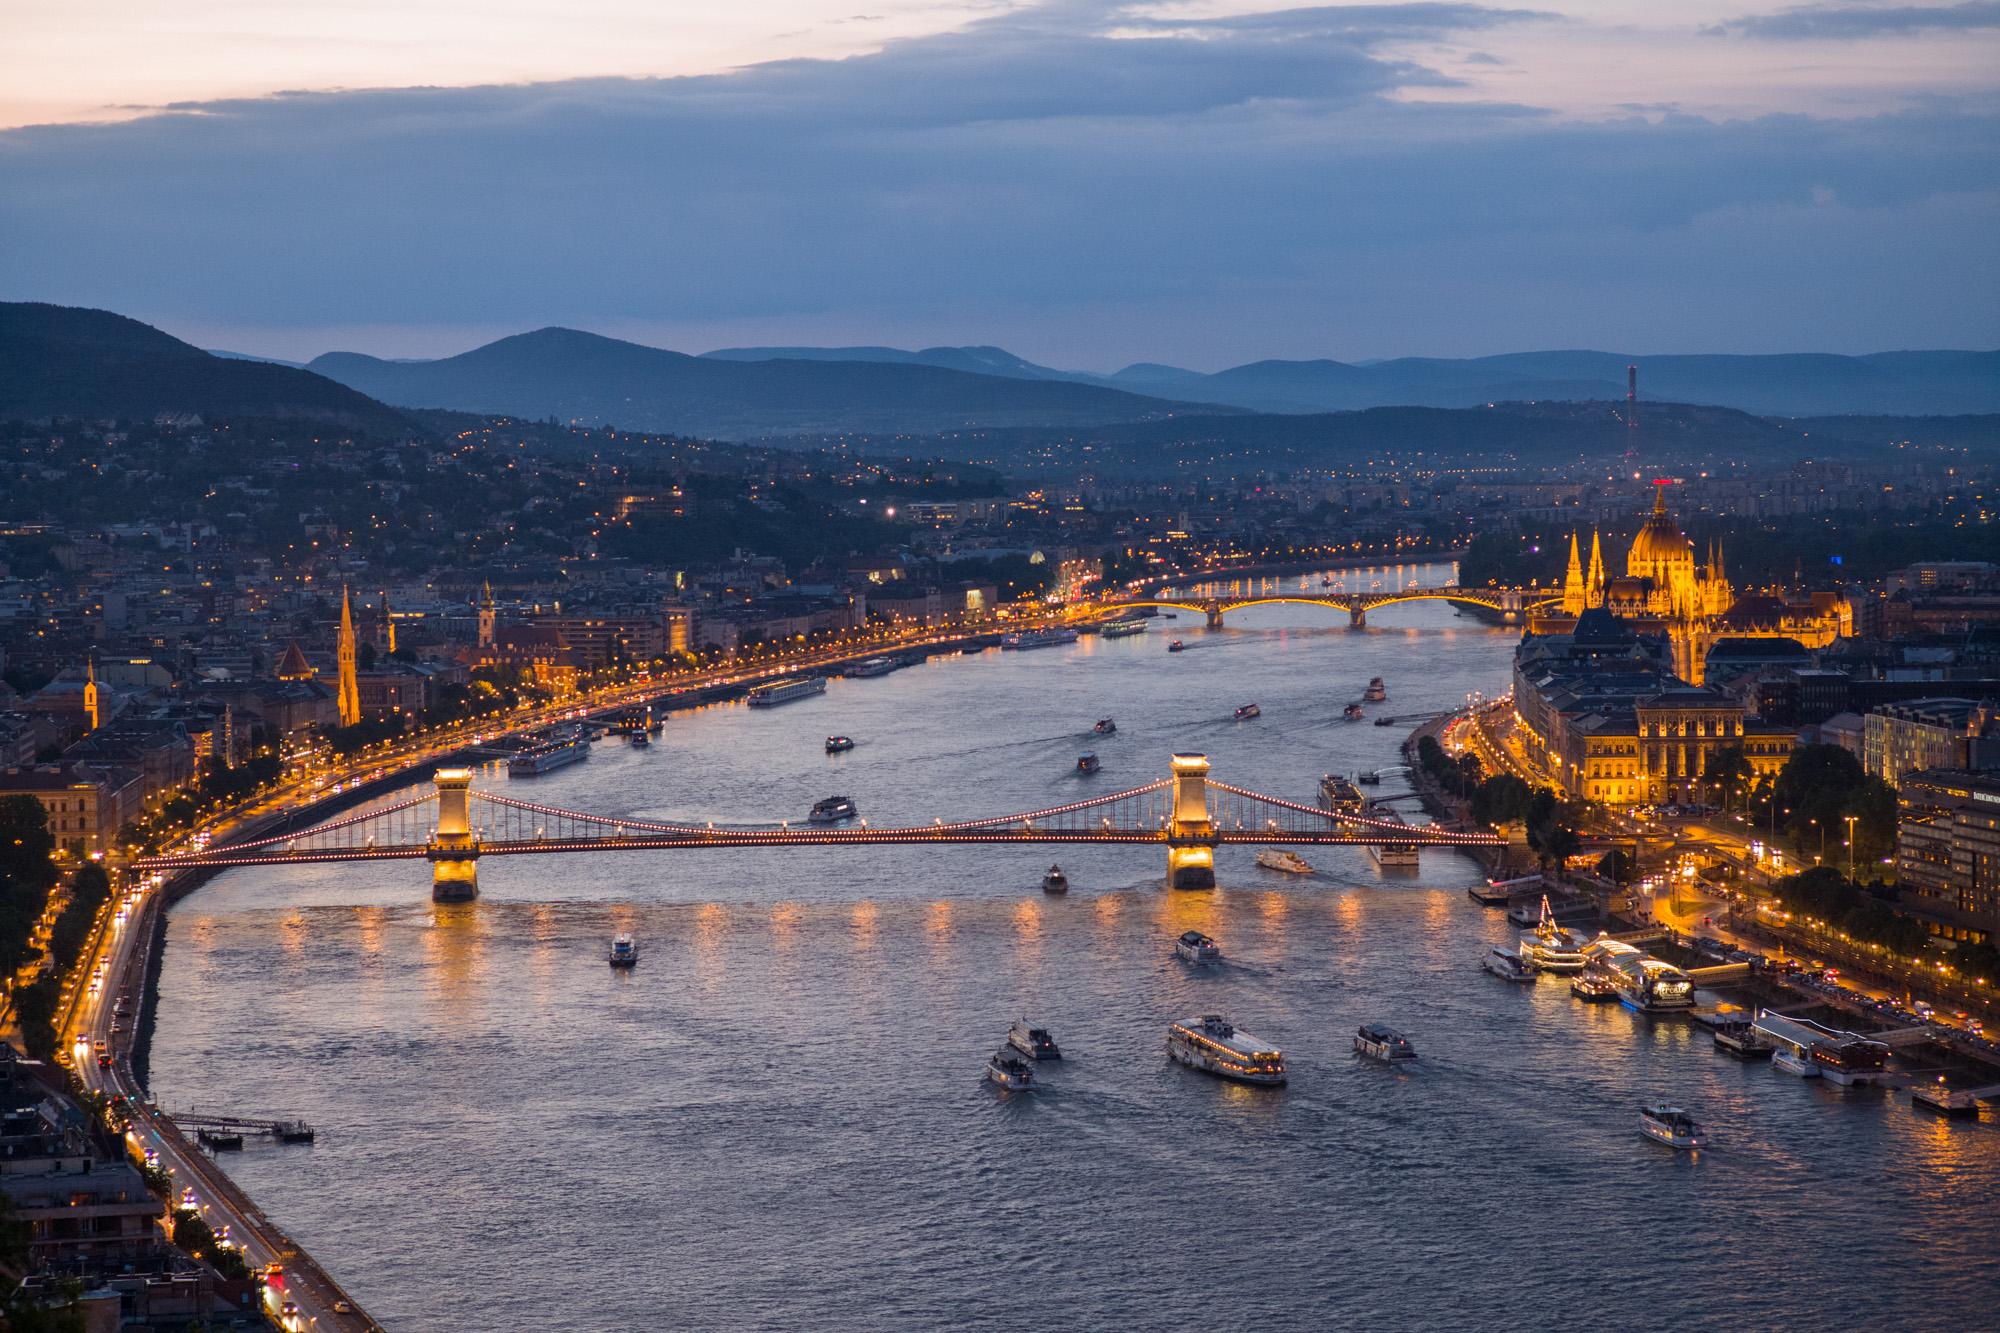 Bridges over the Danube at night